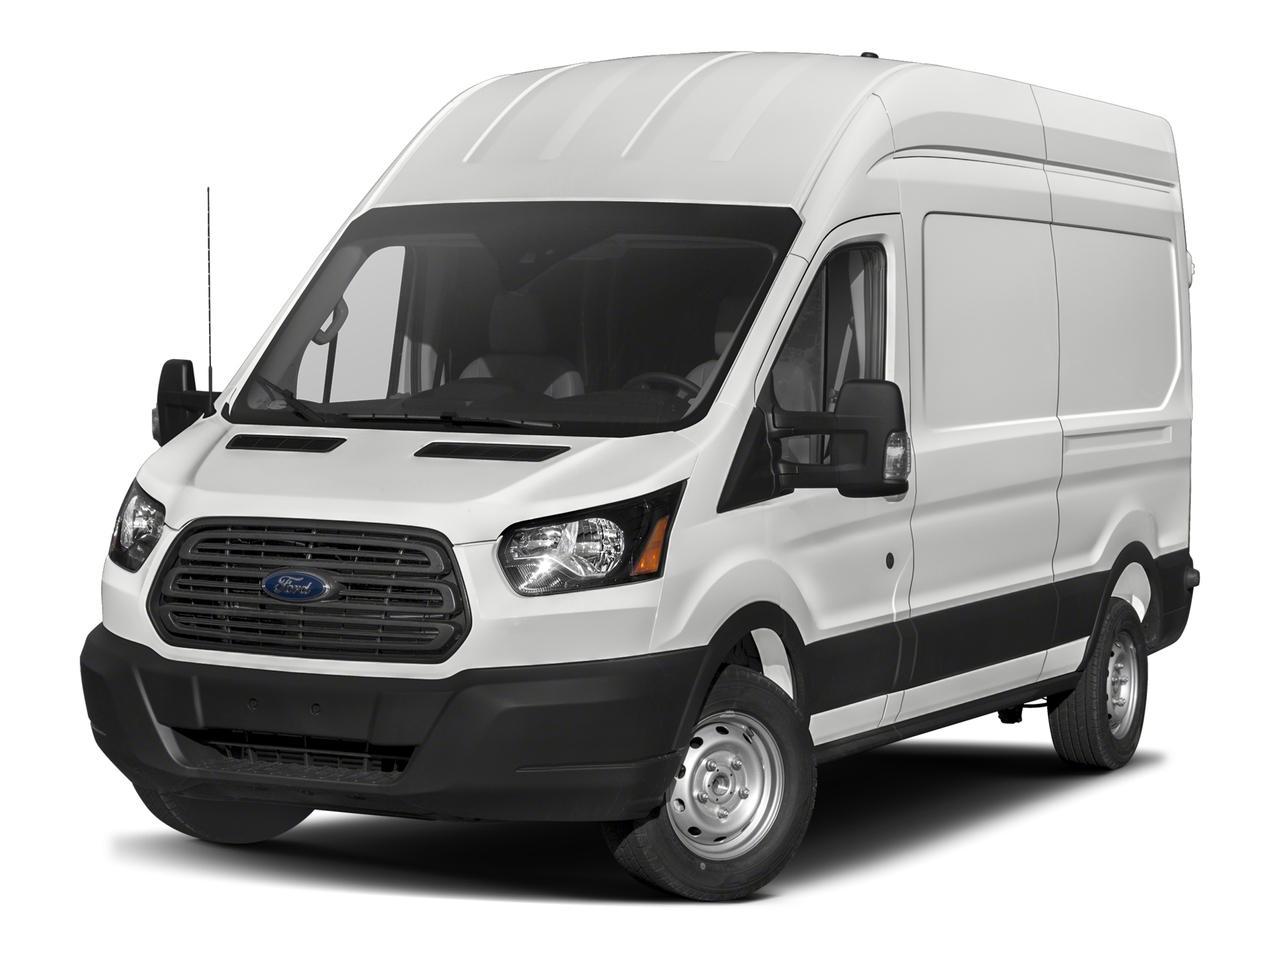 2018 Ford Transit Van Vehicle Photo in Plainfield, IL 60586